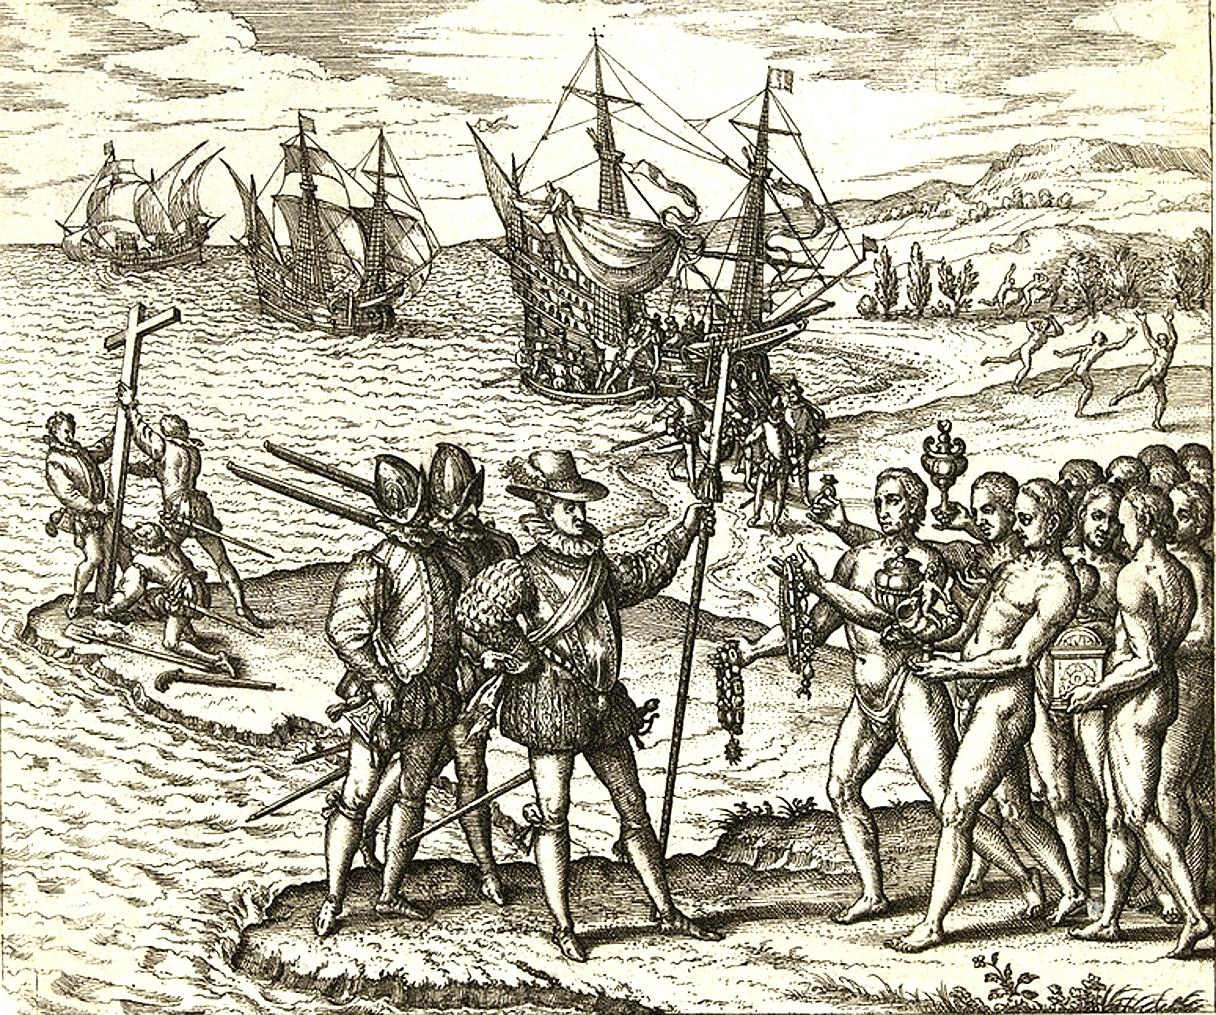 Columbus landing on Hispaniola, October 12, 1492; greeted by Arawak Indians. Litographi by Theodor de Bry (1528–1598), engraver, goldsmith, editor and publisher. based on eyevitnesses. Public Domain.